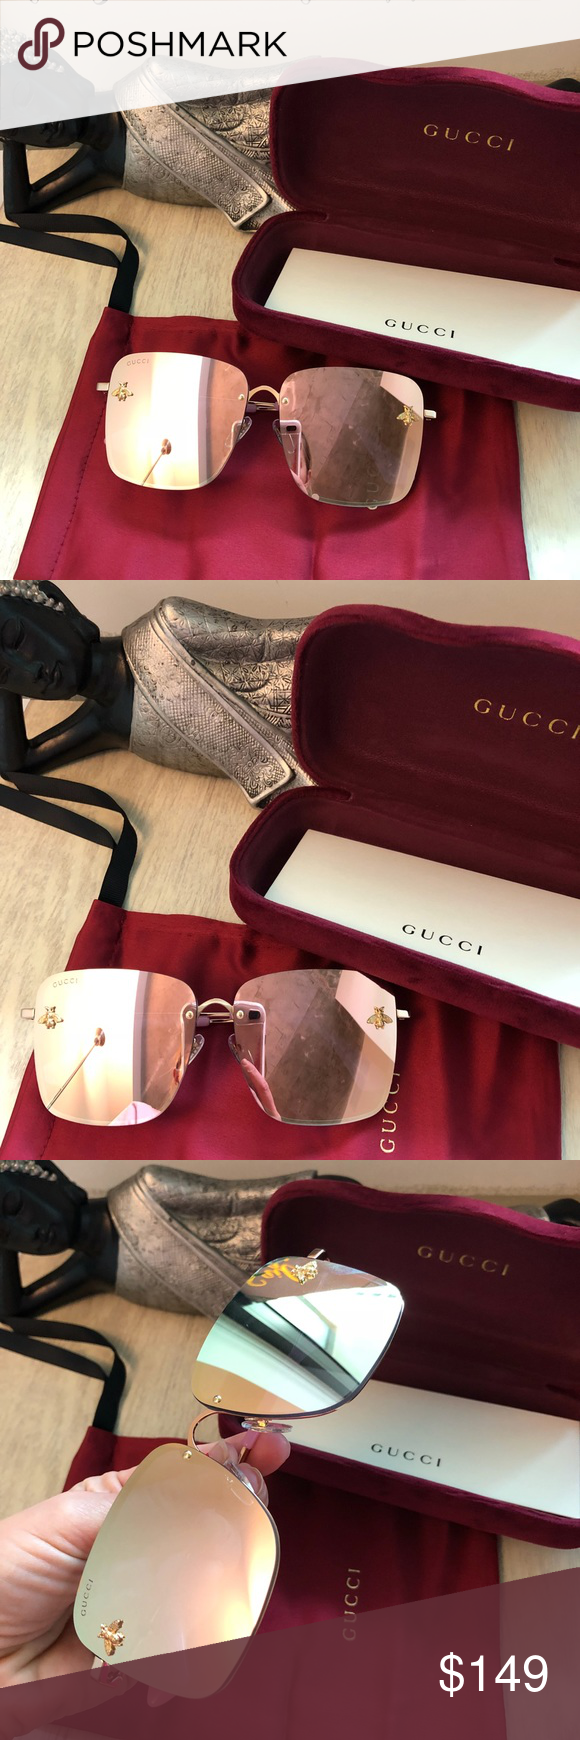 d3e4a079418ce Gucci Sunglasses Gold Bee Collection Used  authentic. Gucci Accessories  Glasses